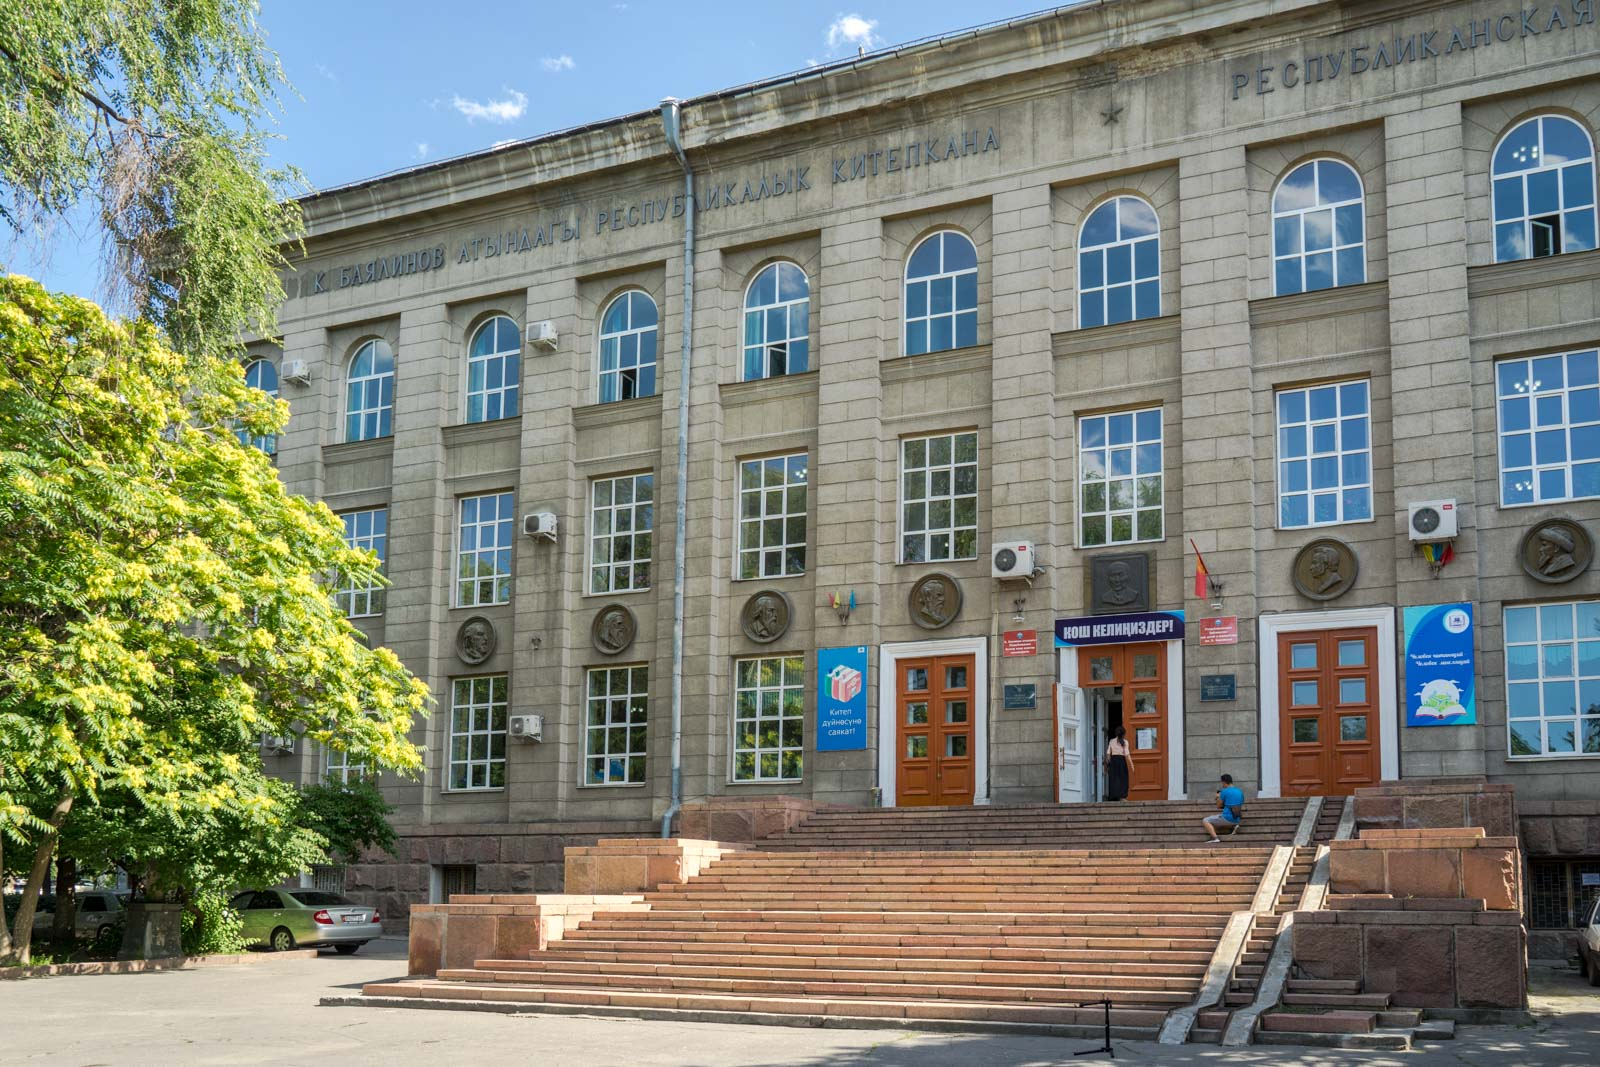 Republican Library for Children, Bishkek, Kyrgyzstan